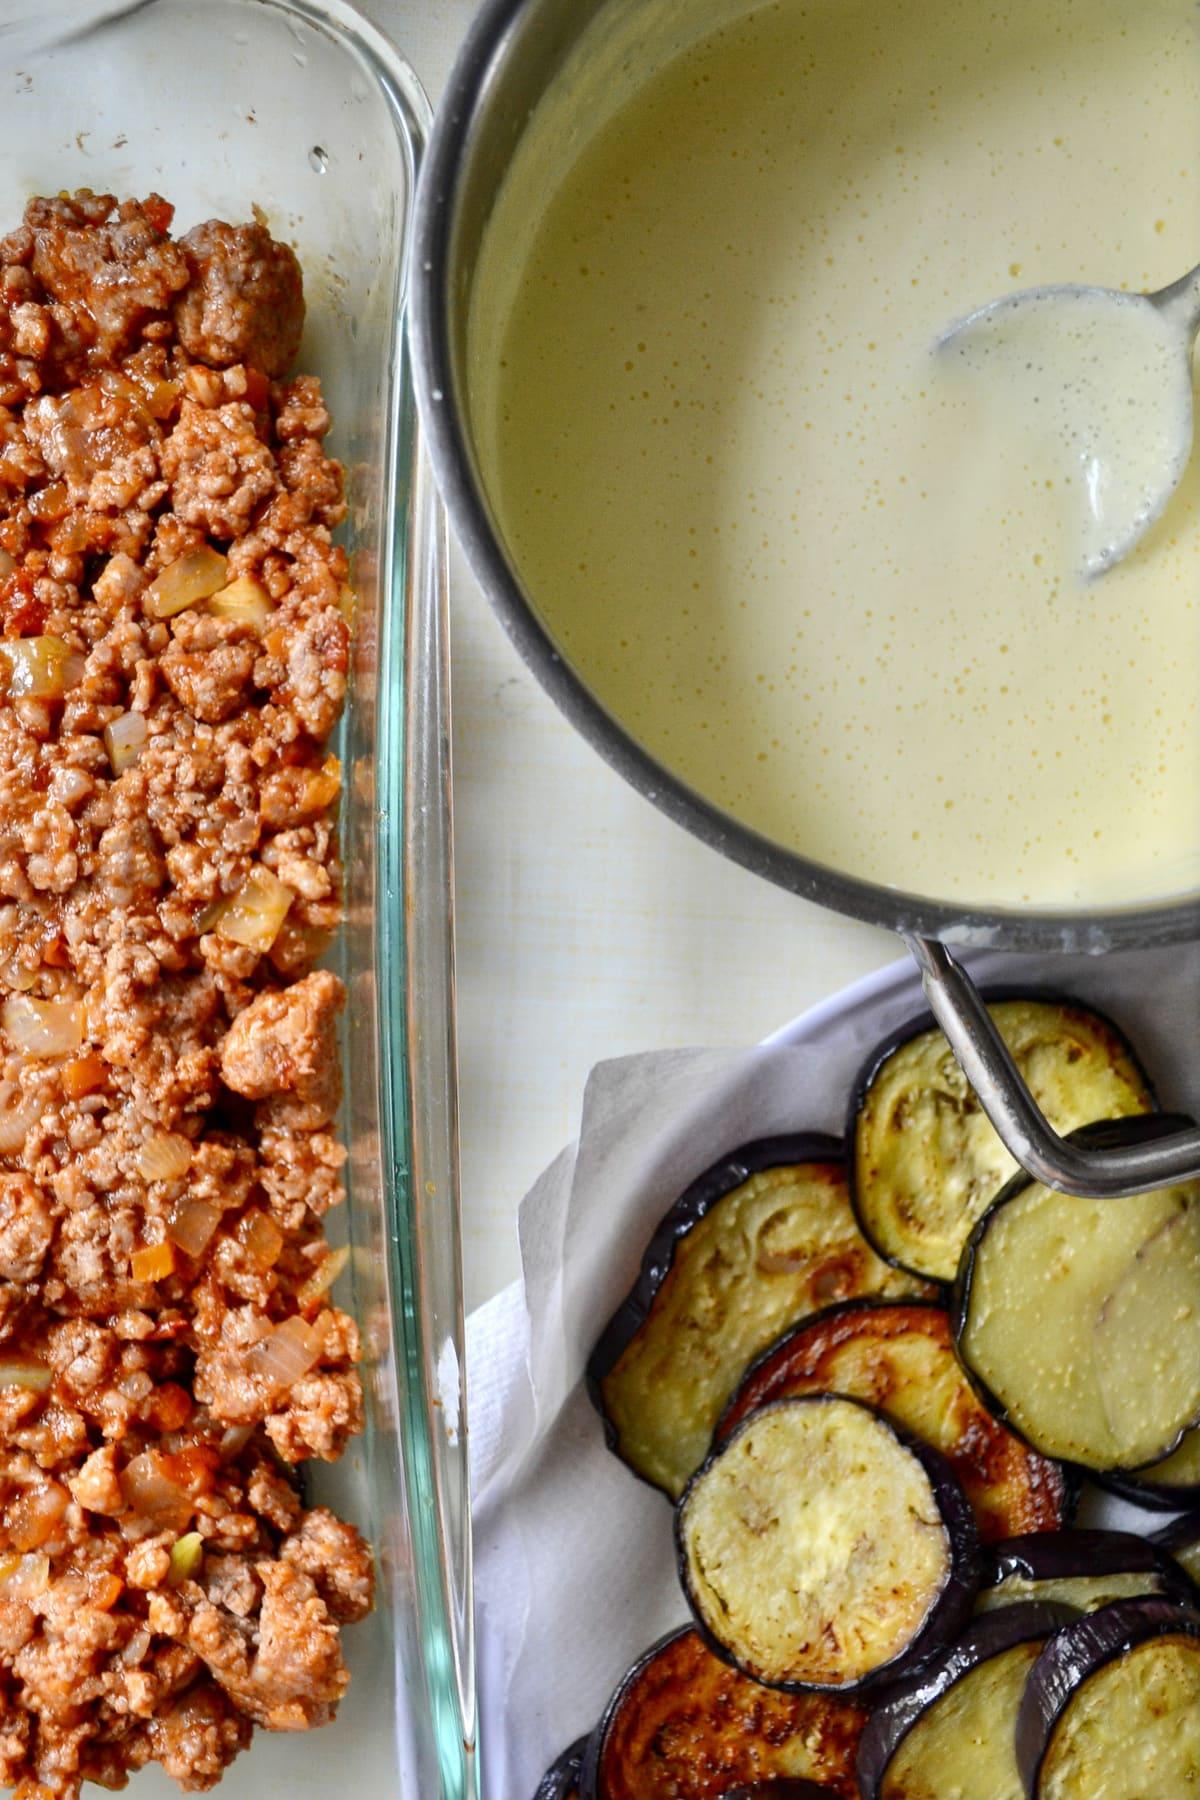 Keto Moussaka With Eggplant ingredients